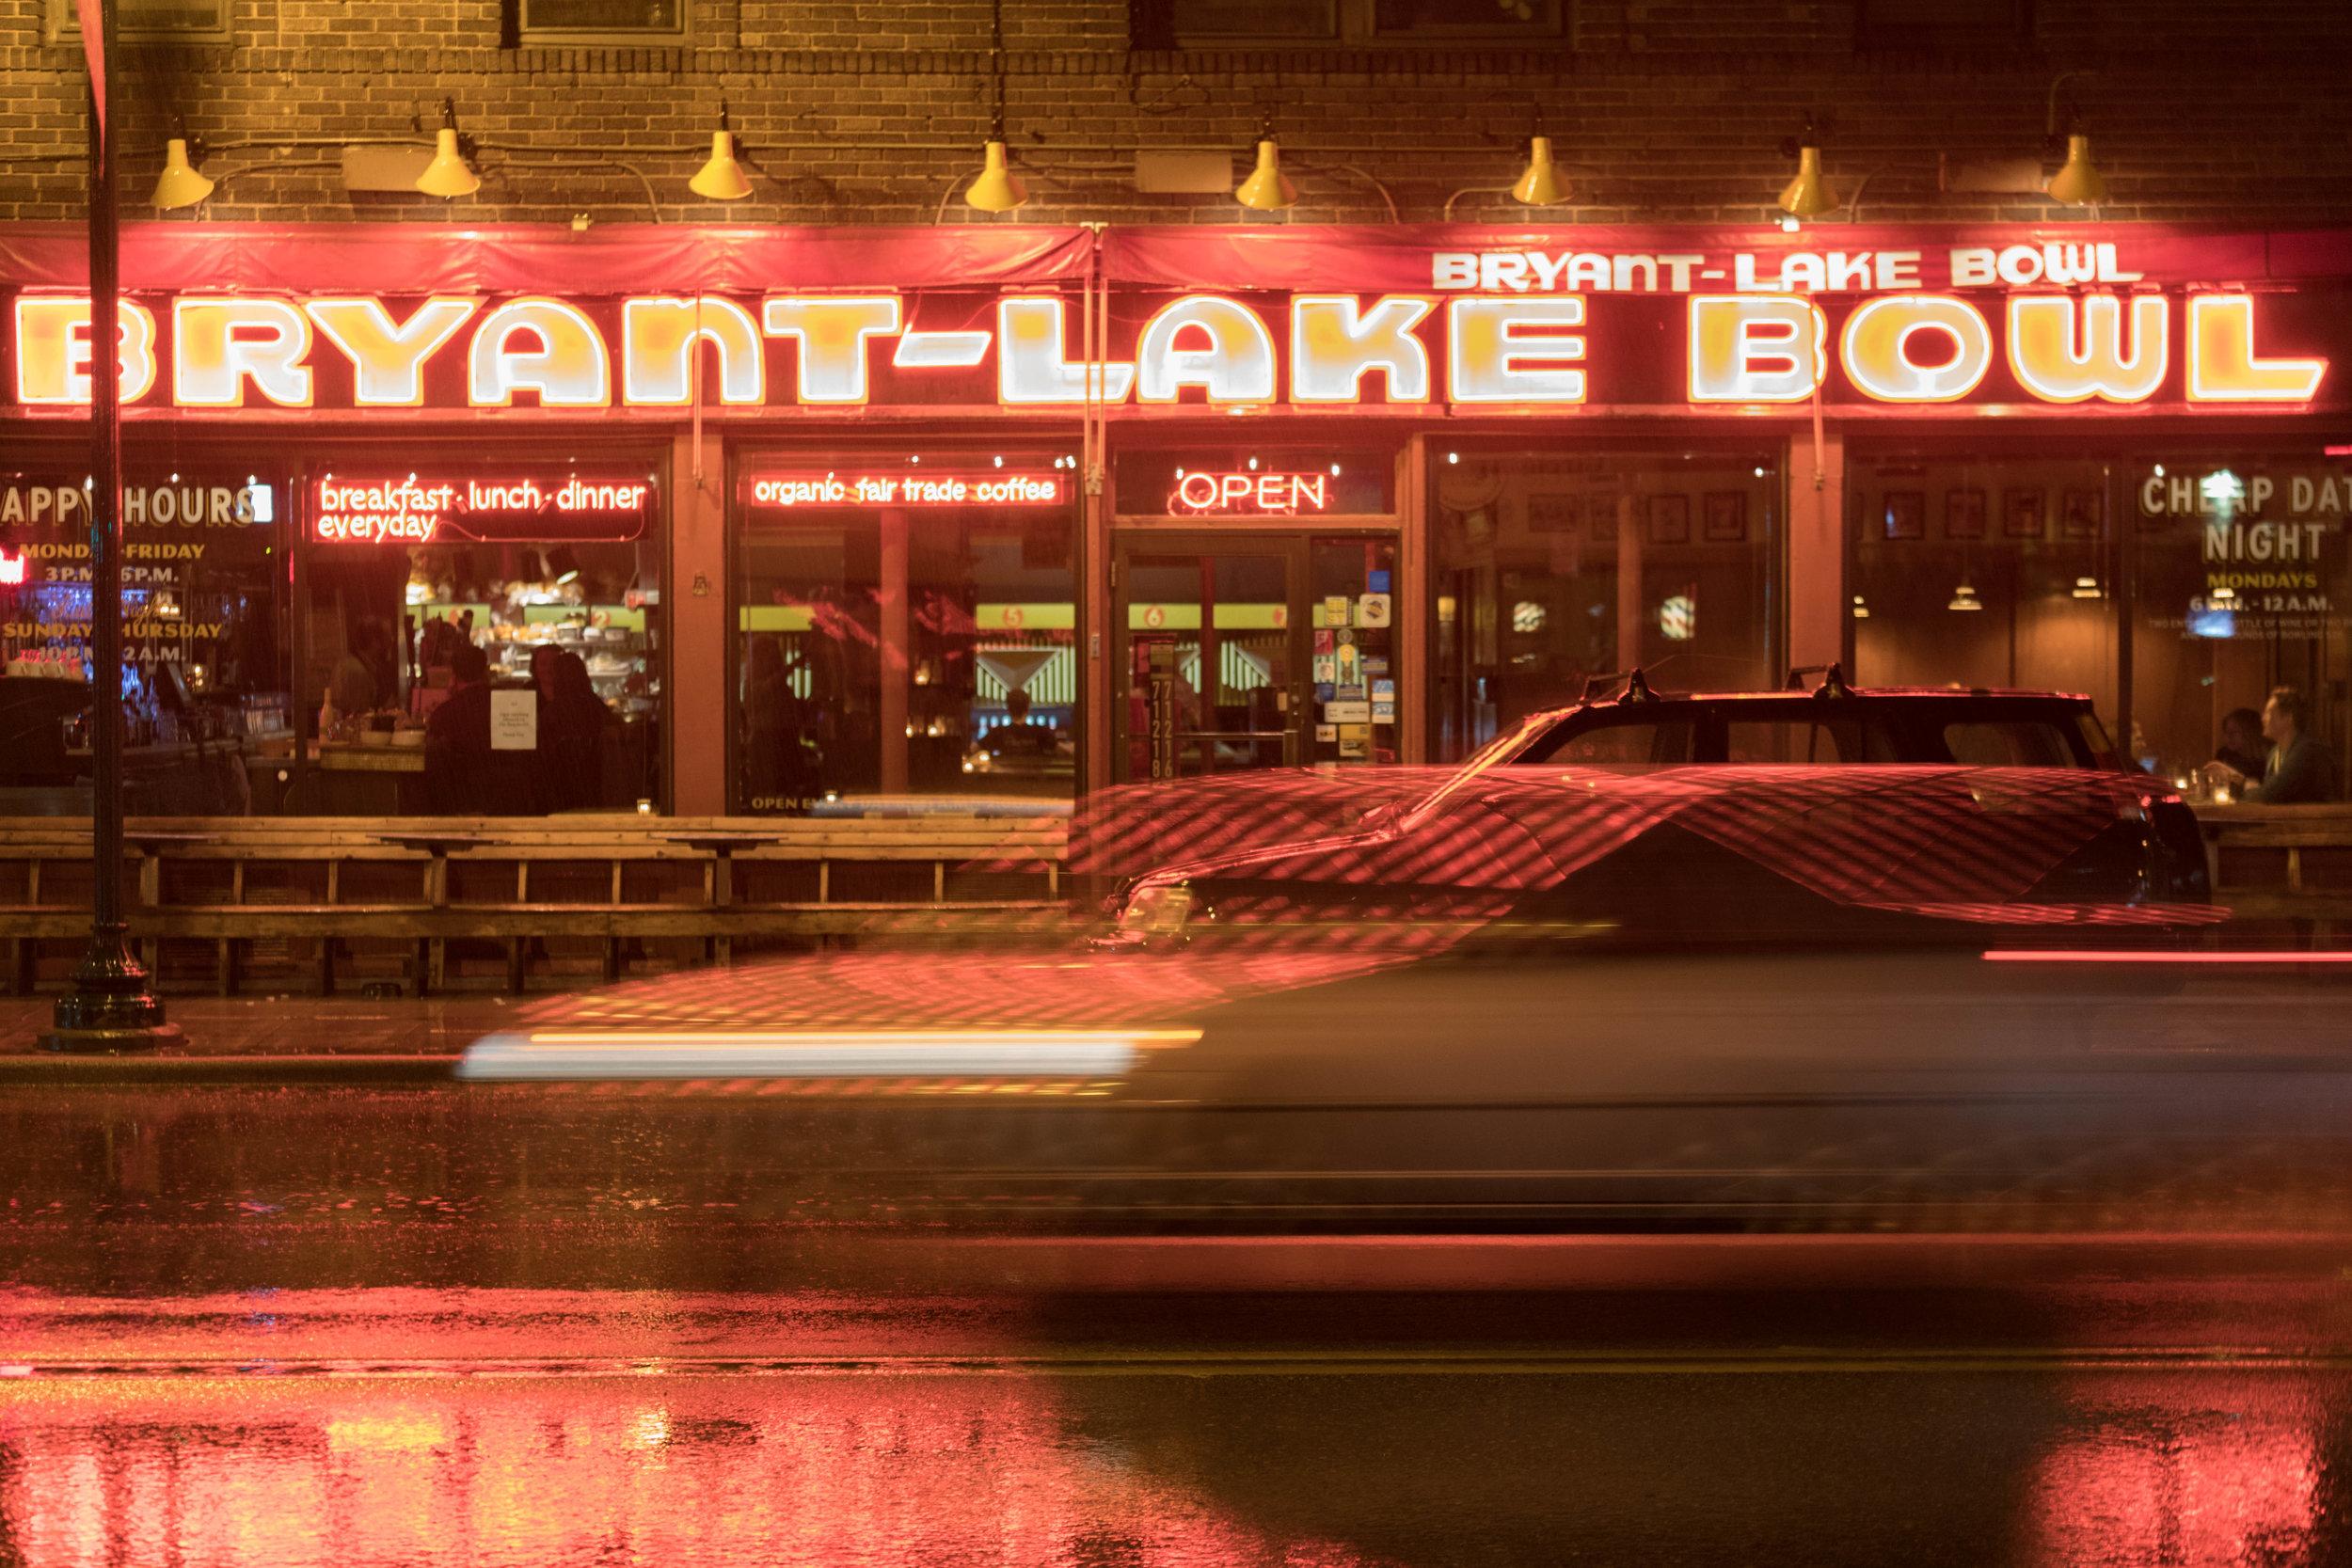 bryant-lake bowl at night - minneapolis, minnesota   from US$15